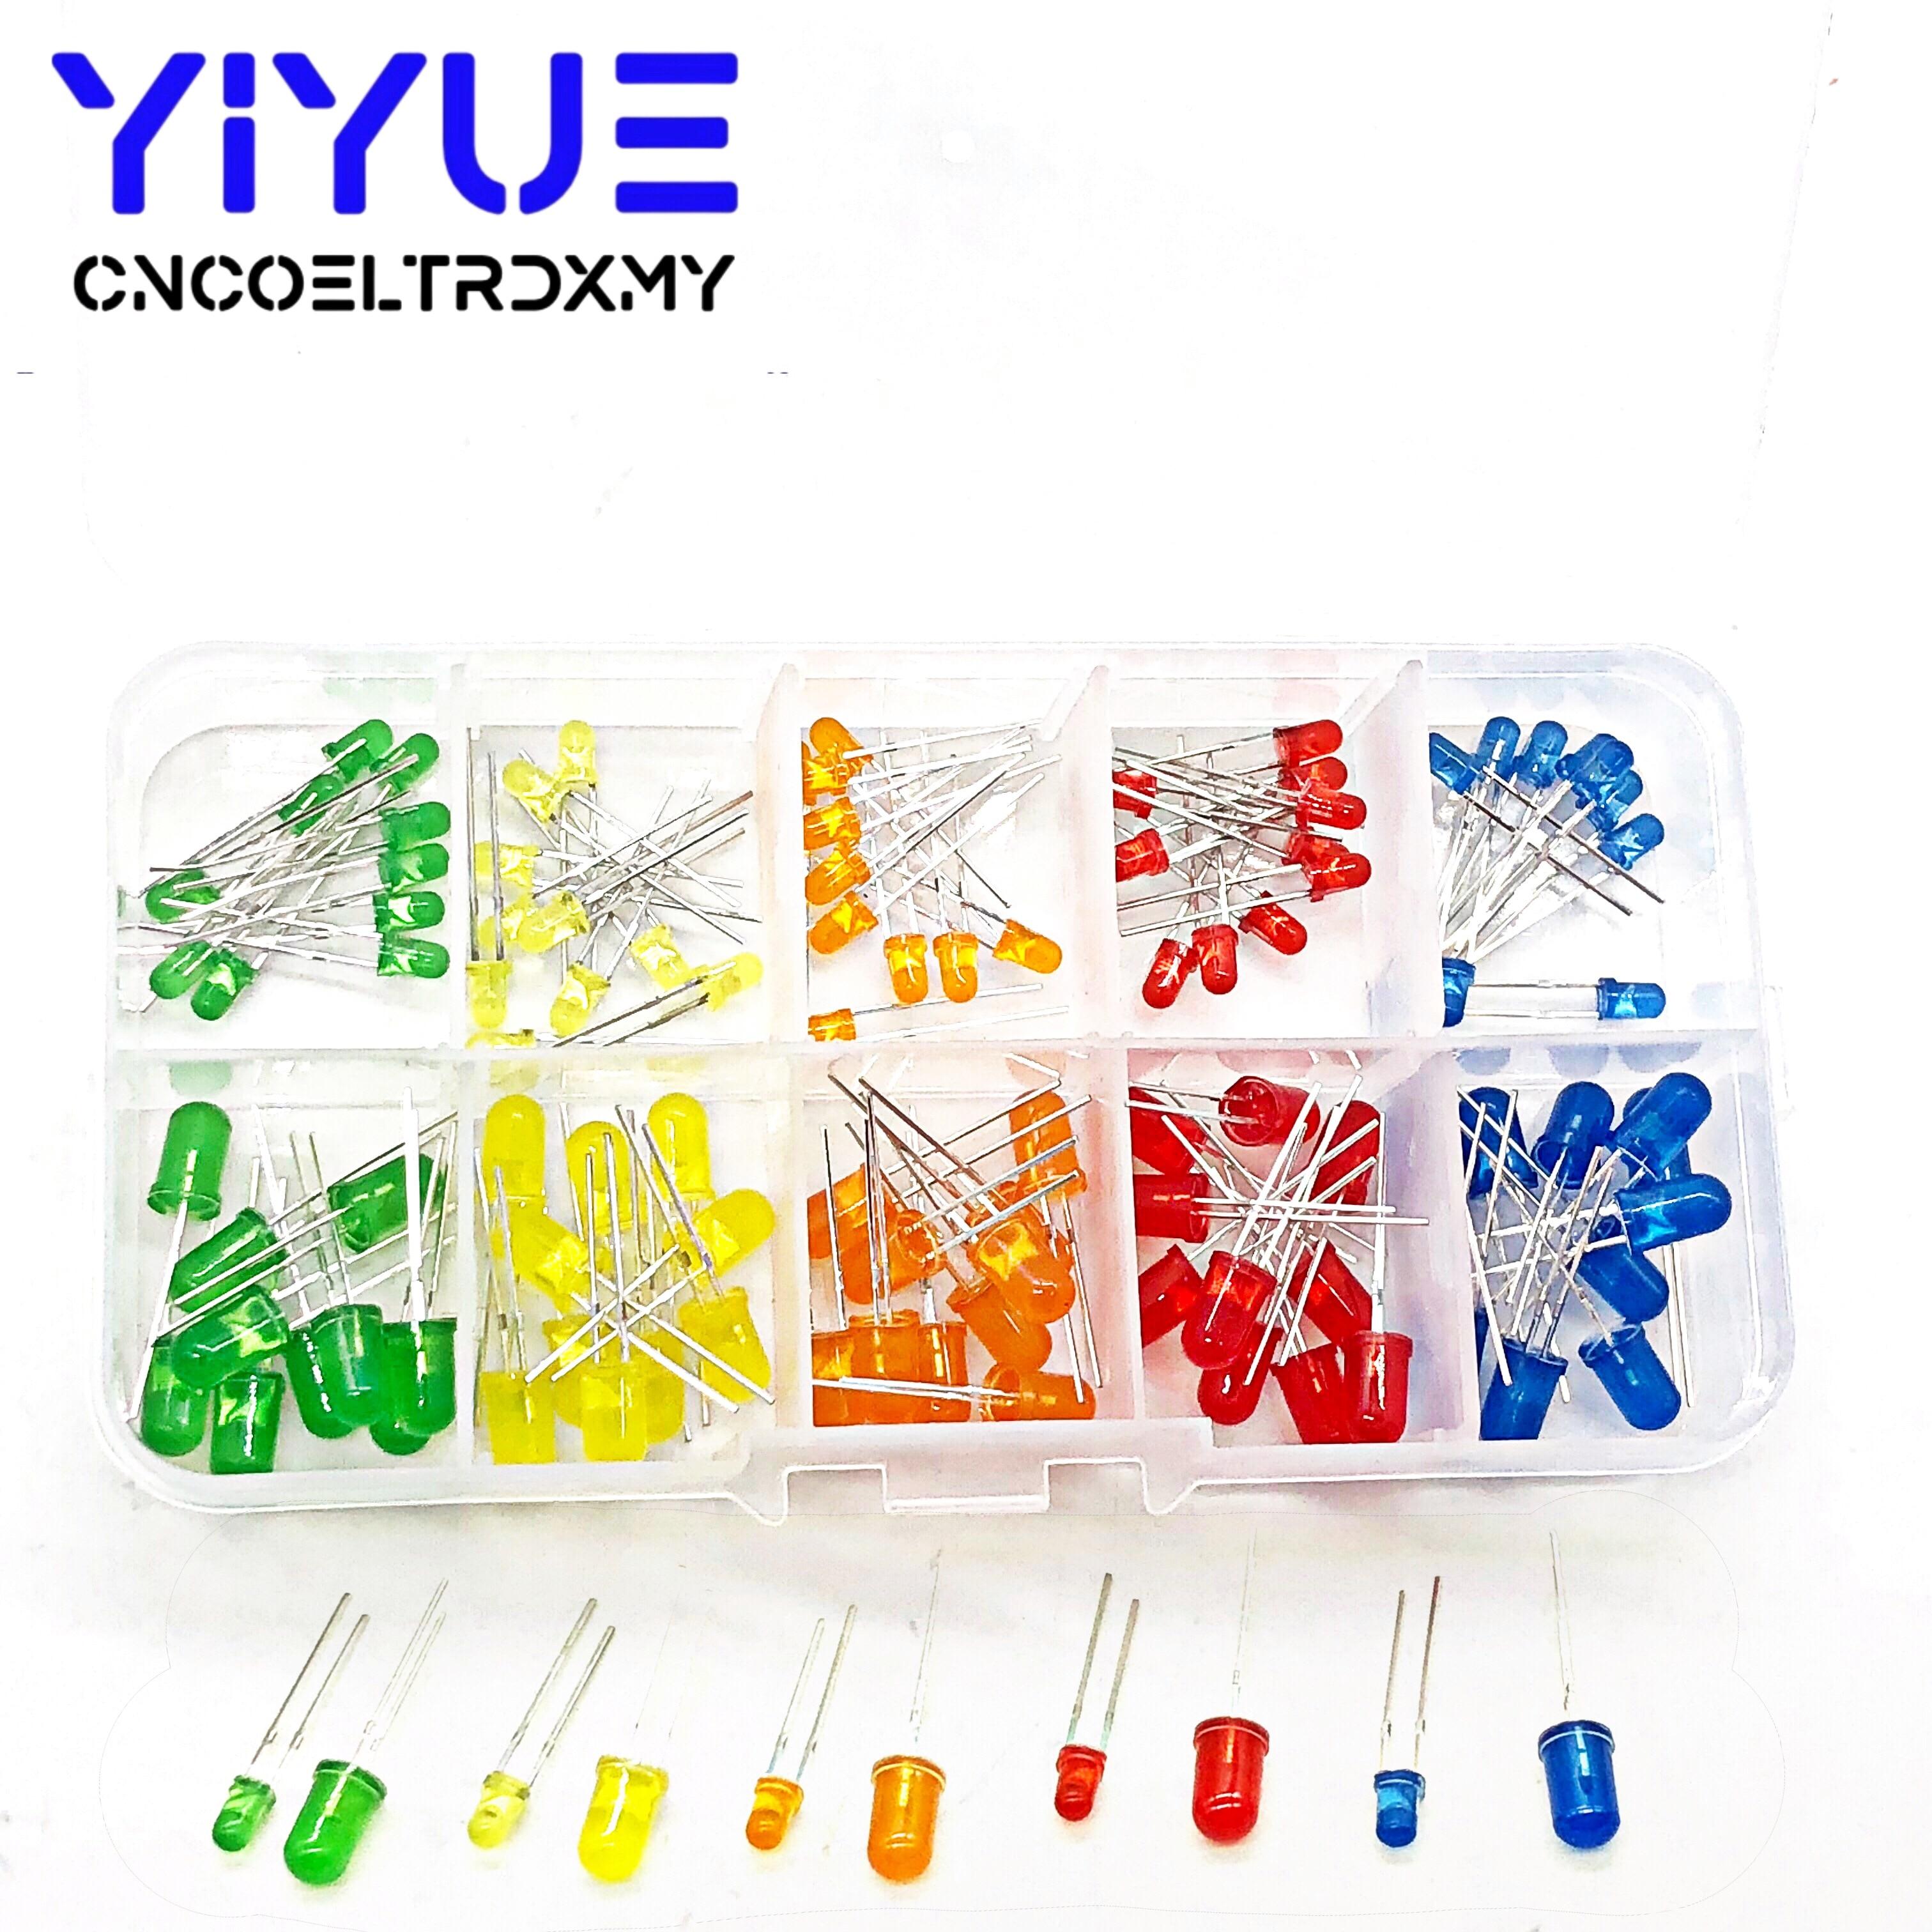 100pcs LED Emitting Diodes Light Kit 5 Colors Round Top 3mm/5mm  Yellow Red Blue Green Orange Assortment Kit For DIY Lighting